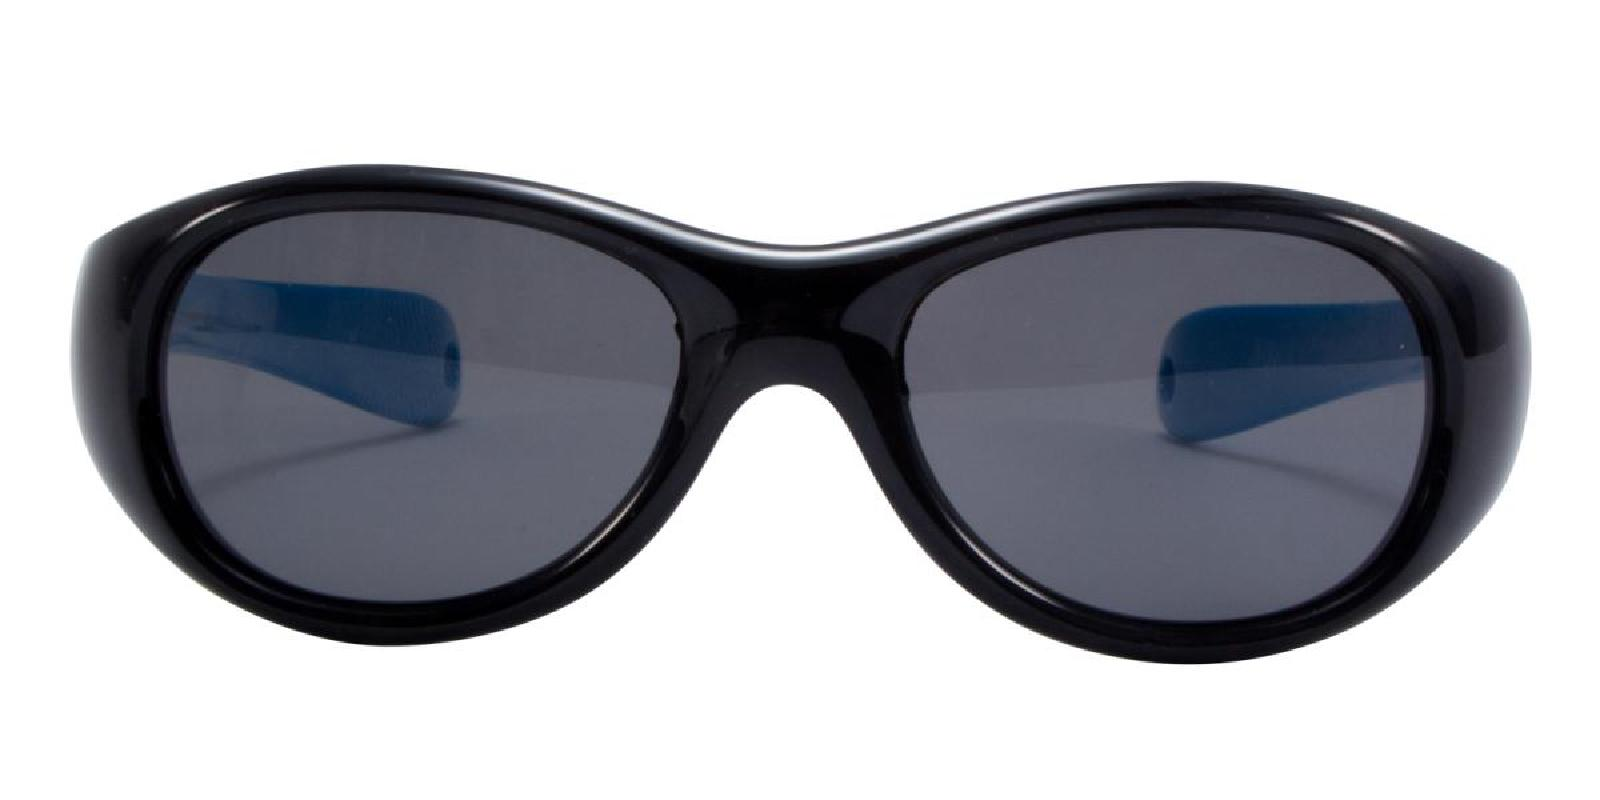 Frog-Black-Oval-TR-Sunglasses-additional2